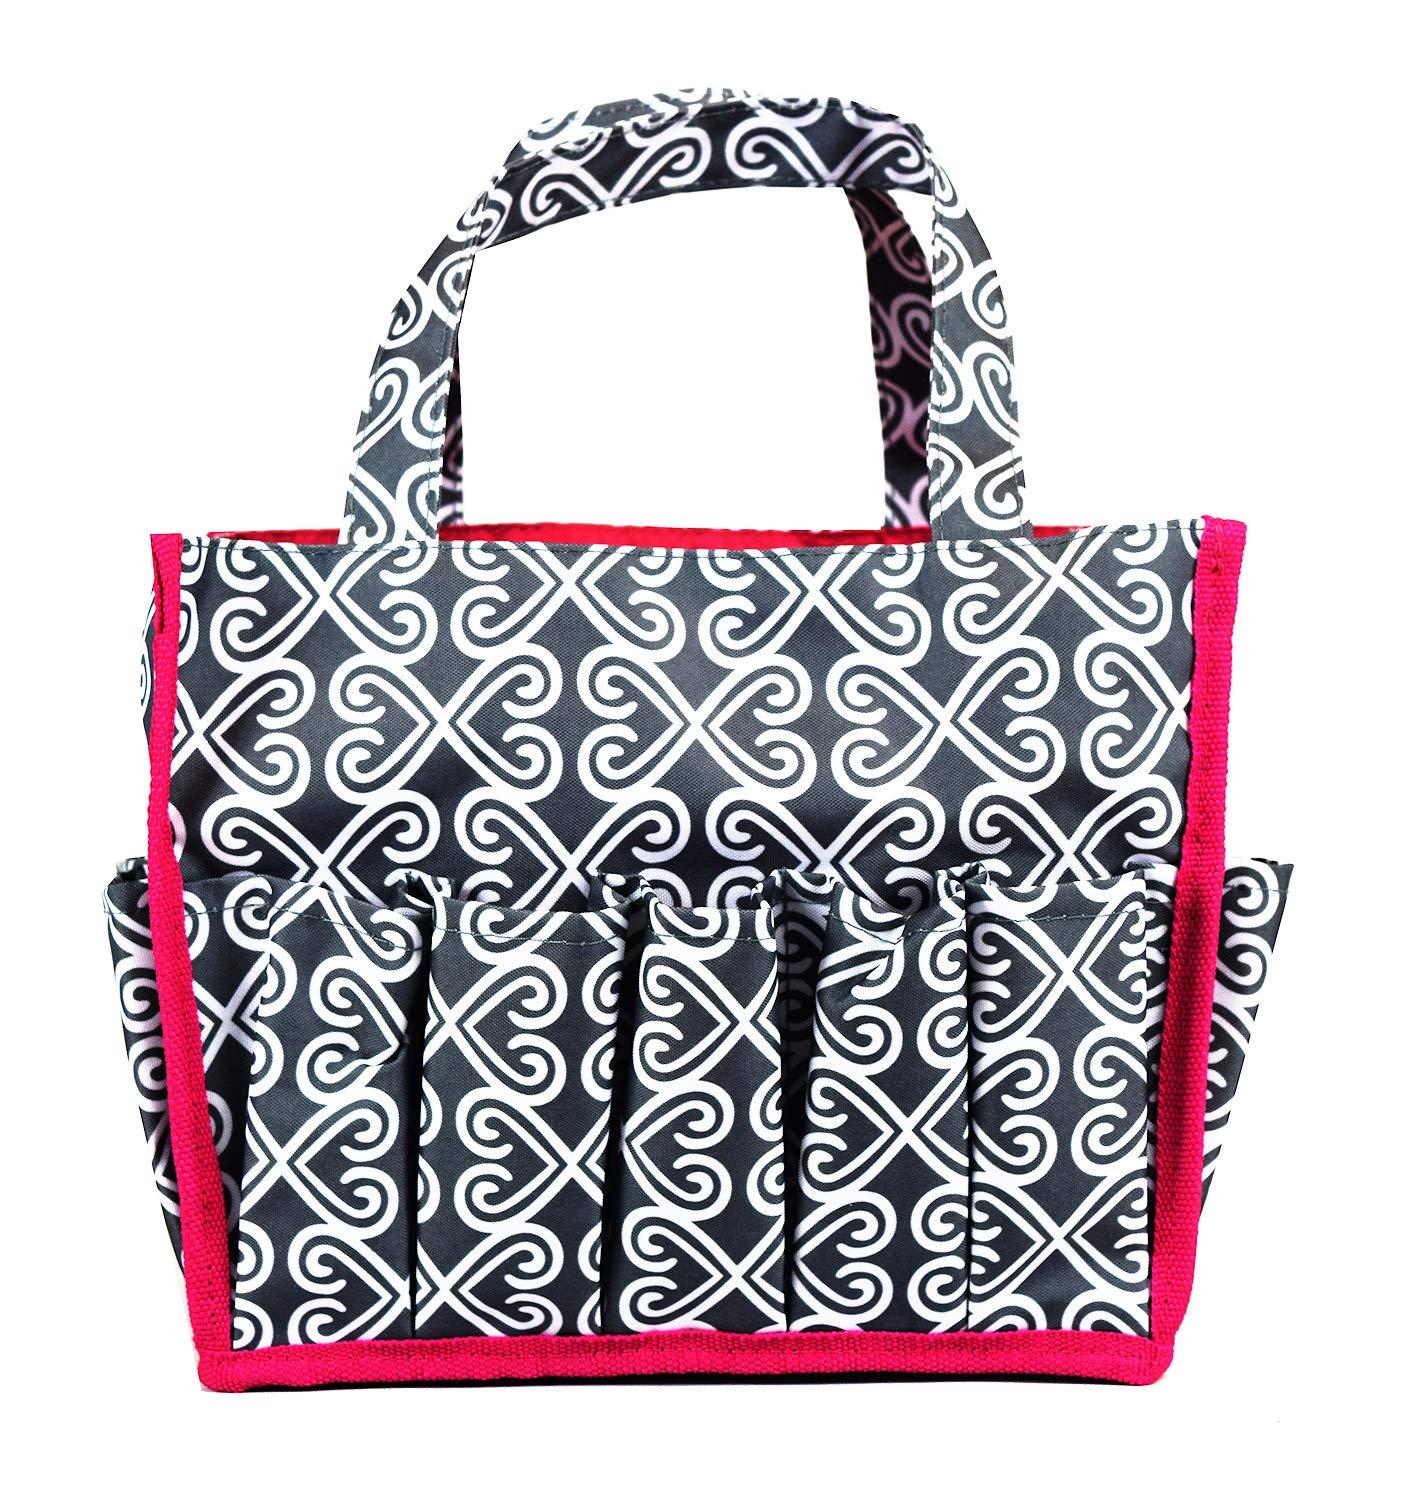 Grey white Heart Baby Diaper Caddy Organizer, Baby Shower Gift Basket For Boys Girls Diaper Tote Bag,